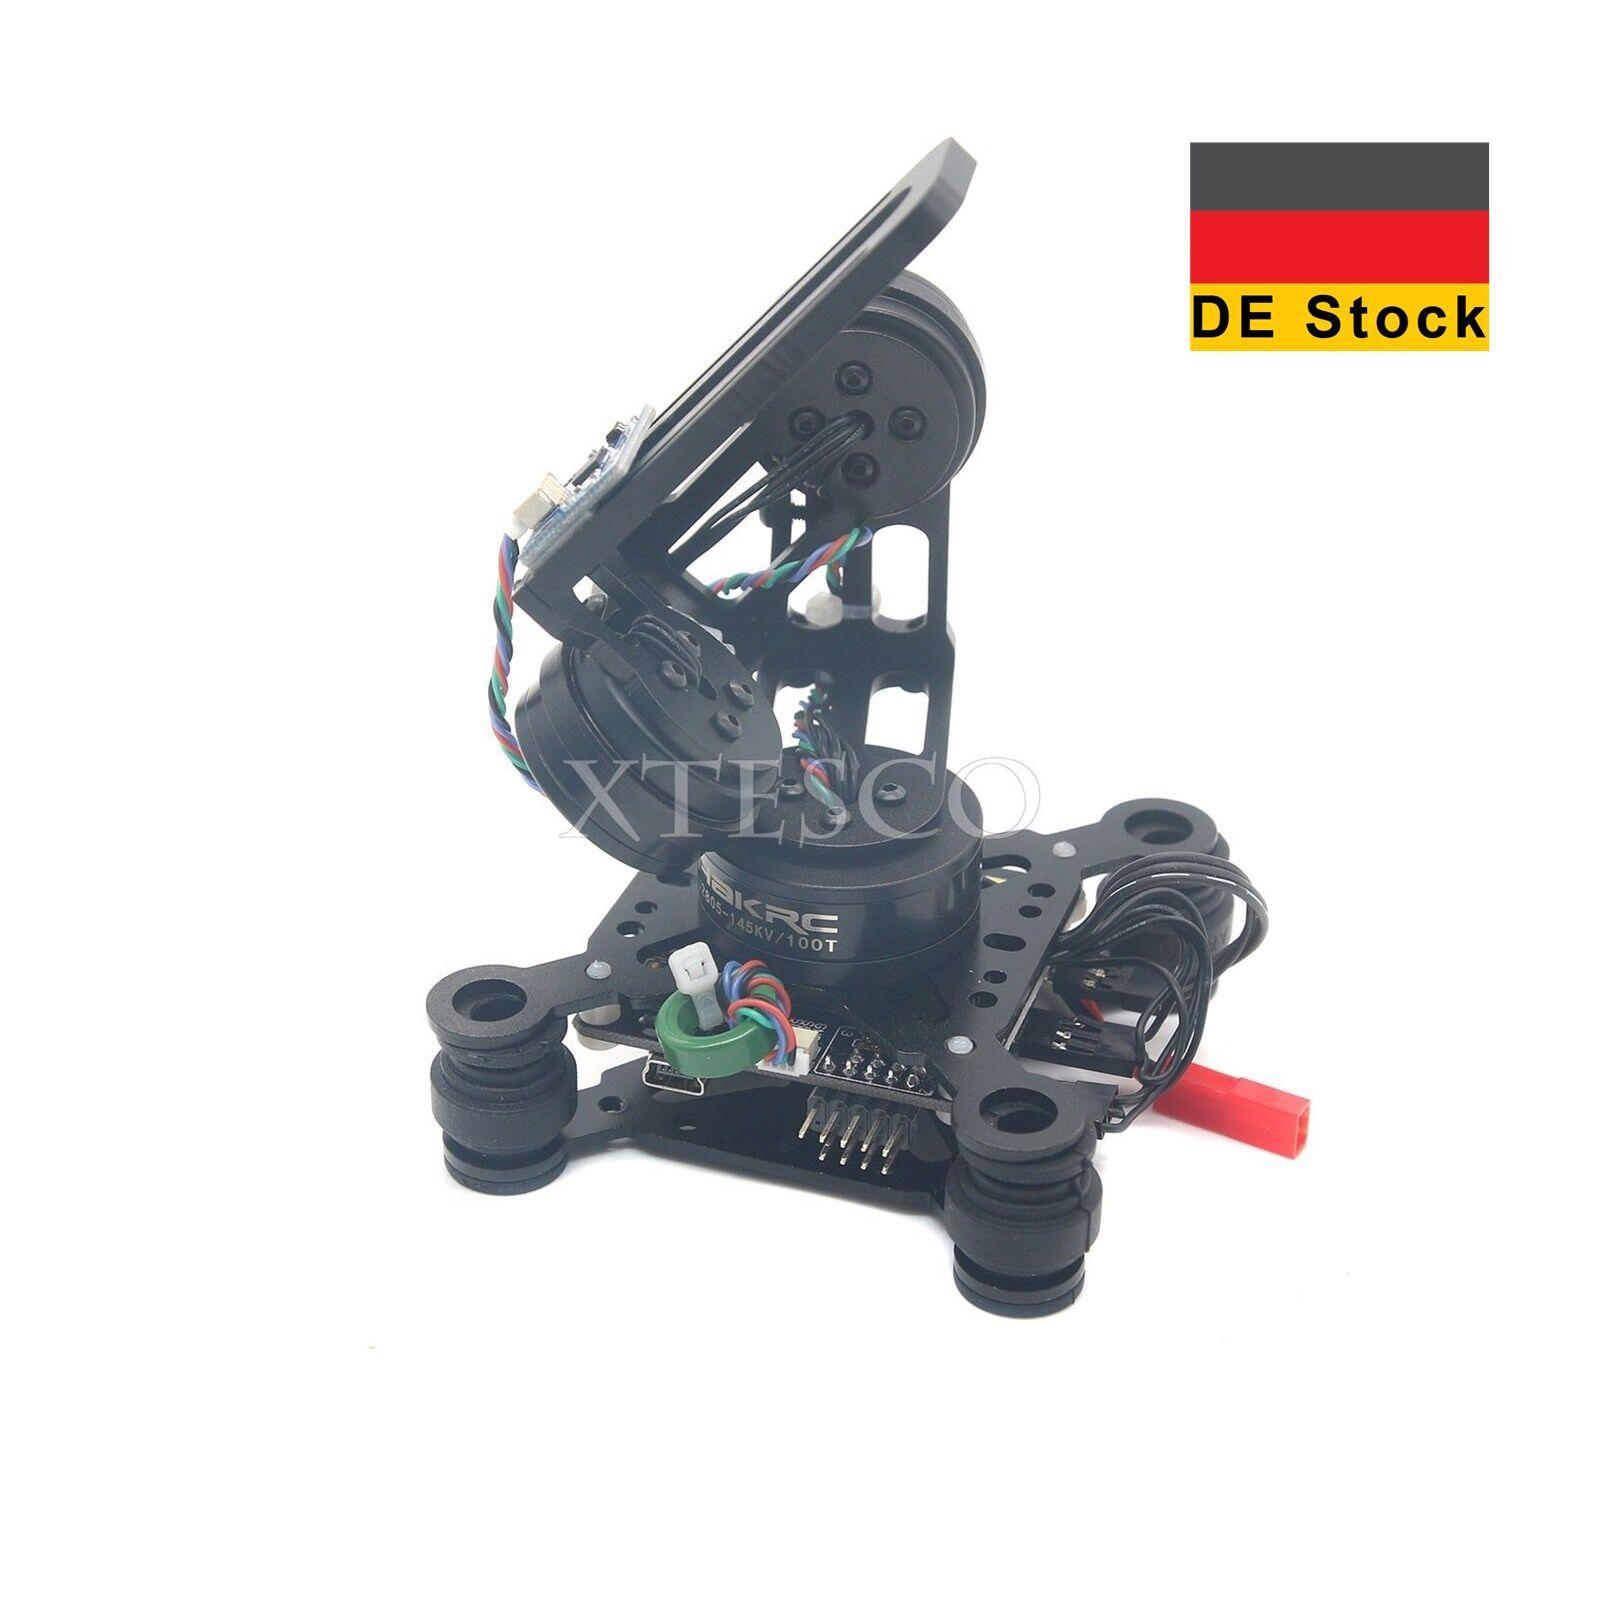 prezzo basso Storm 32 FPV FPV FPV Brushless Gimbal GoPro telecamera PTZ STABILIZER Motors 32 controller XS  promozioni